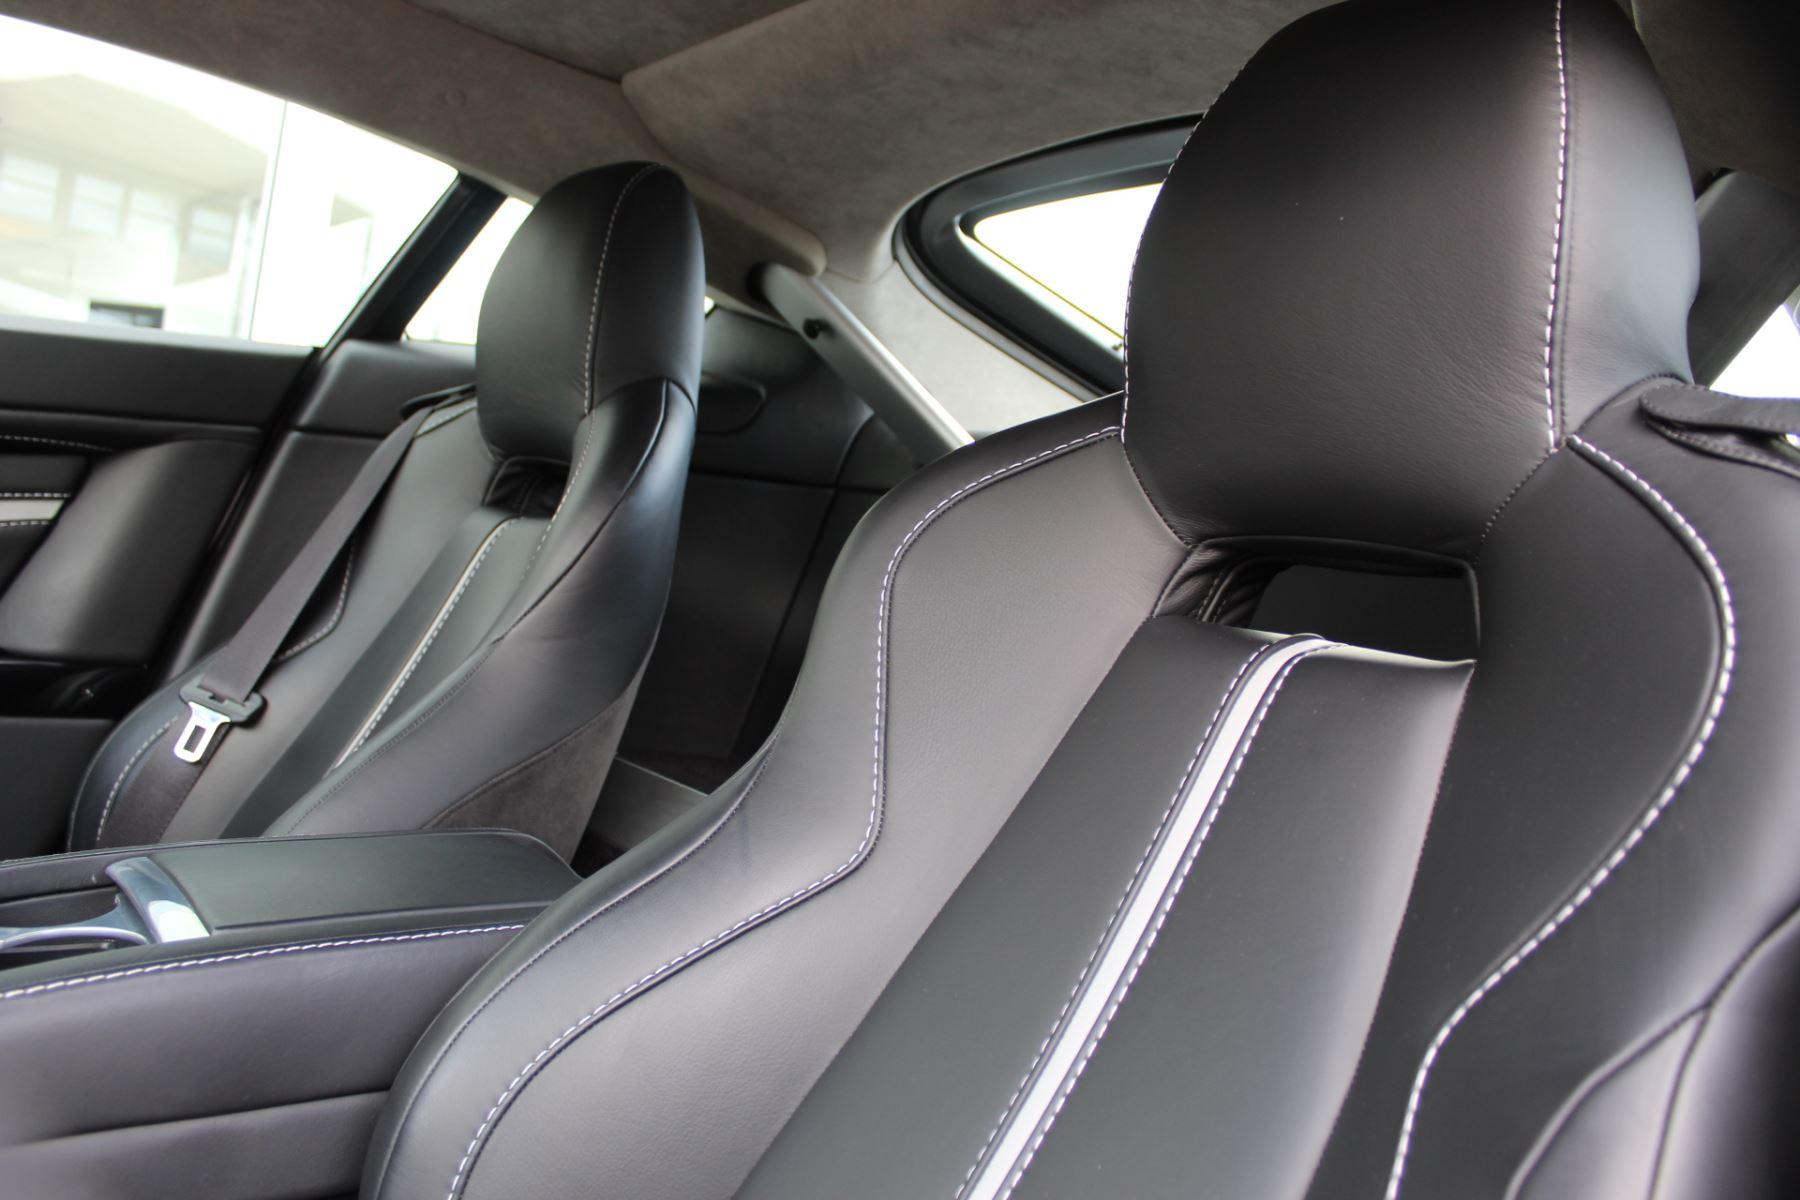 Aston Martin V12 Vantage S Coupe S 2dr Sportshift III image 10